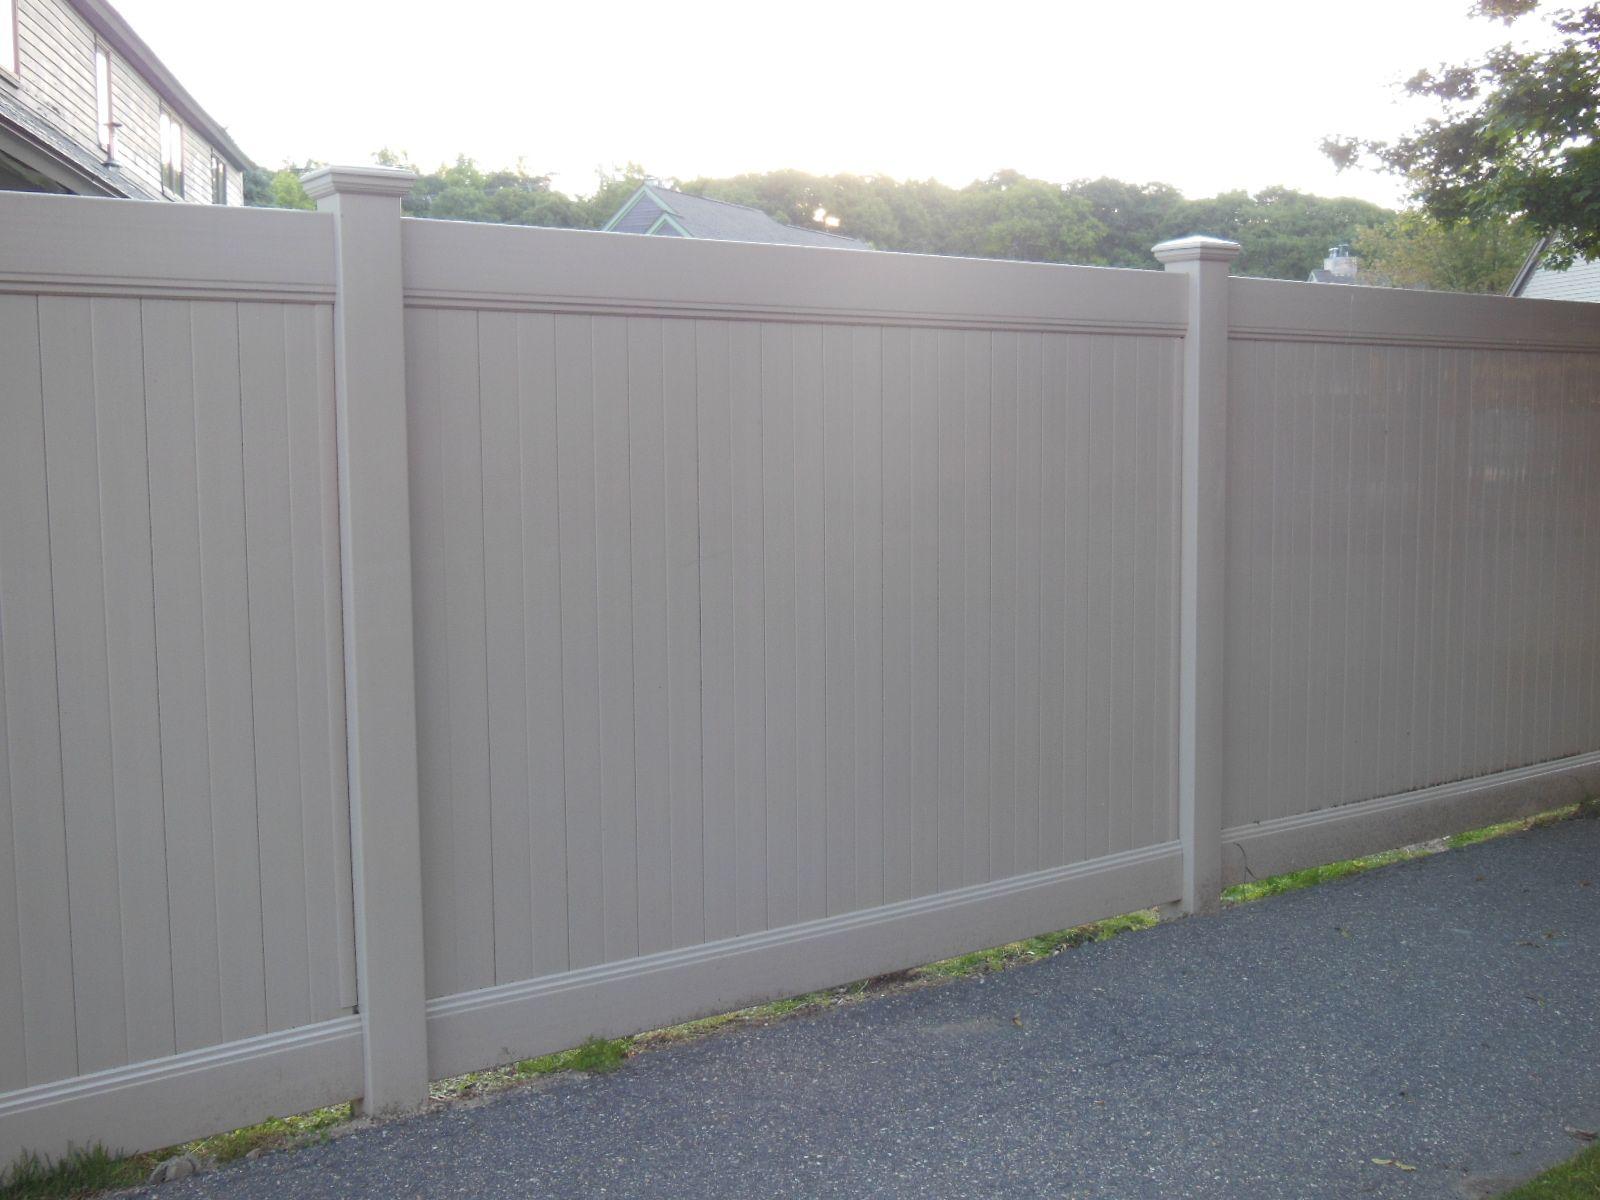 6 High Beige Vinyl Privacy Fence Vinyl Fences In 2019